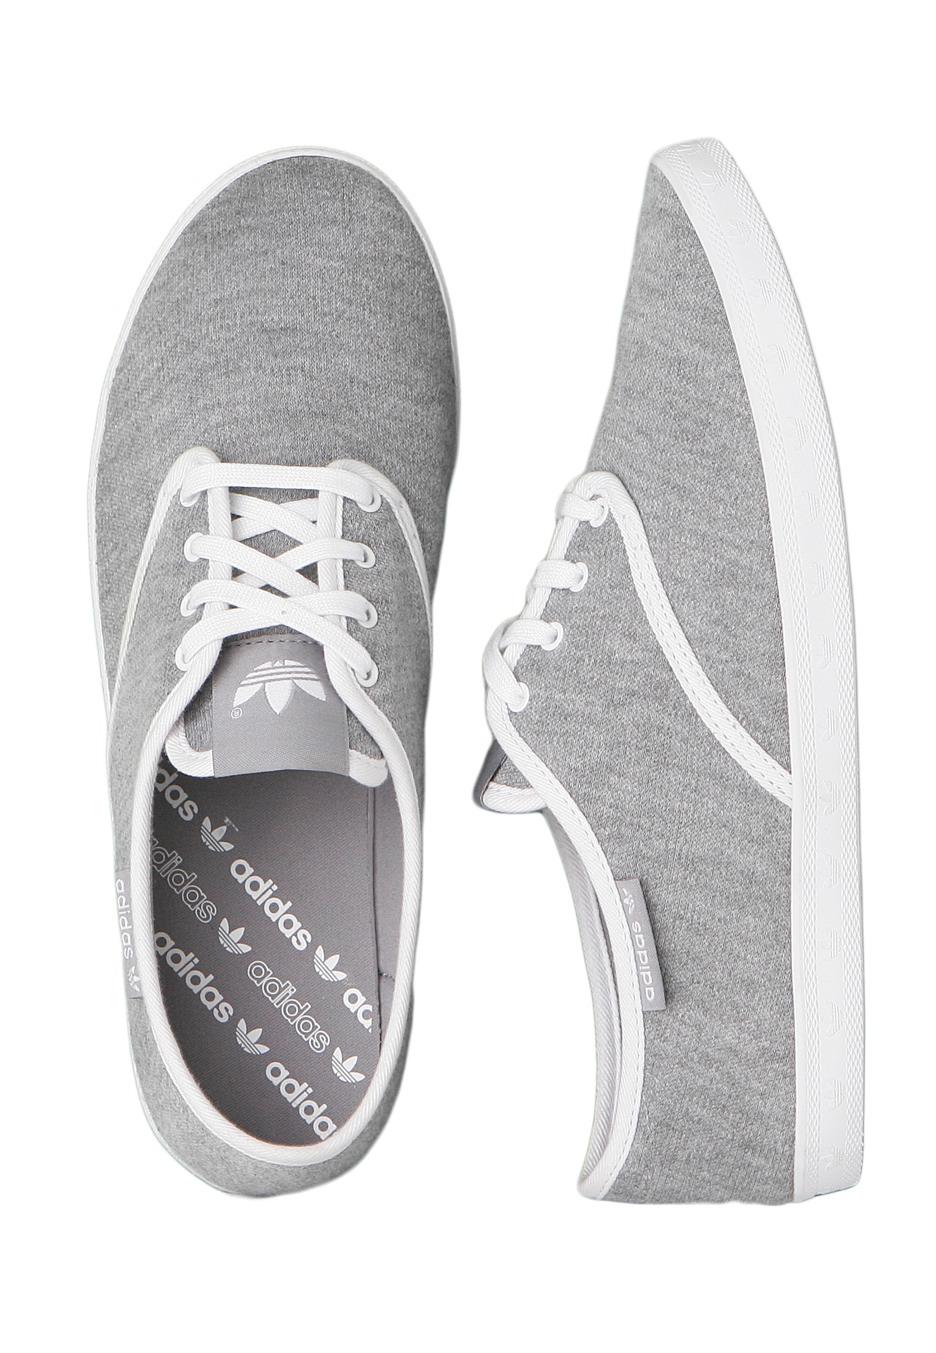 Adidas - Adria PS Medium Grey Heather  Shift Grey  White - Girl Shoes -  Impericon.com UK 19e07fb84319